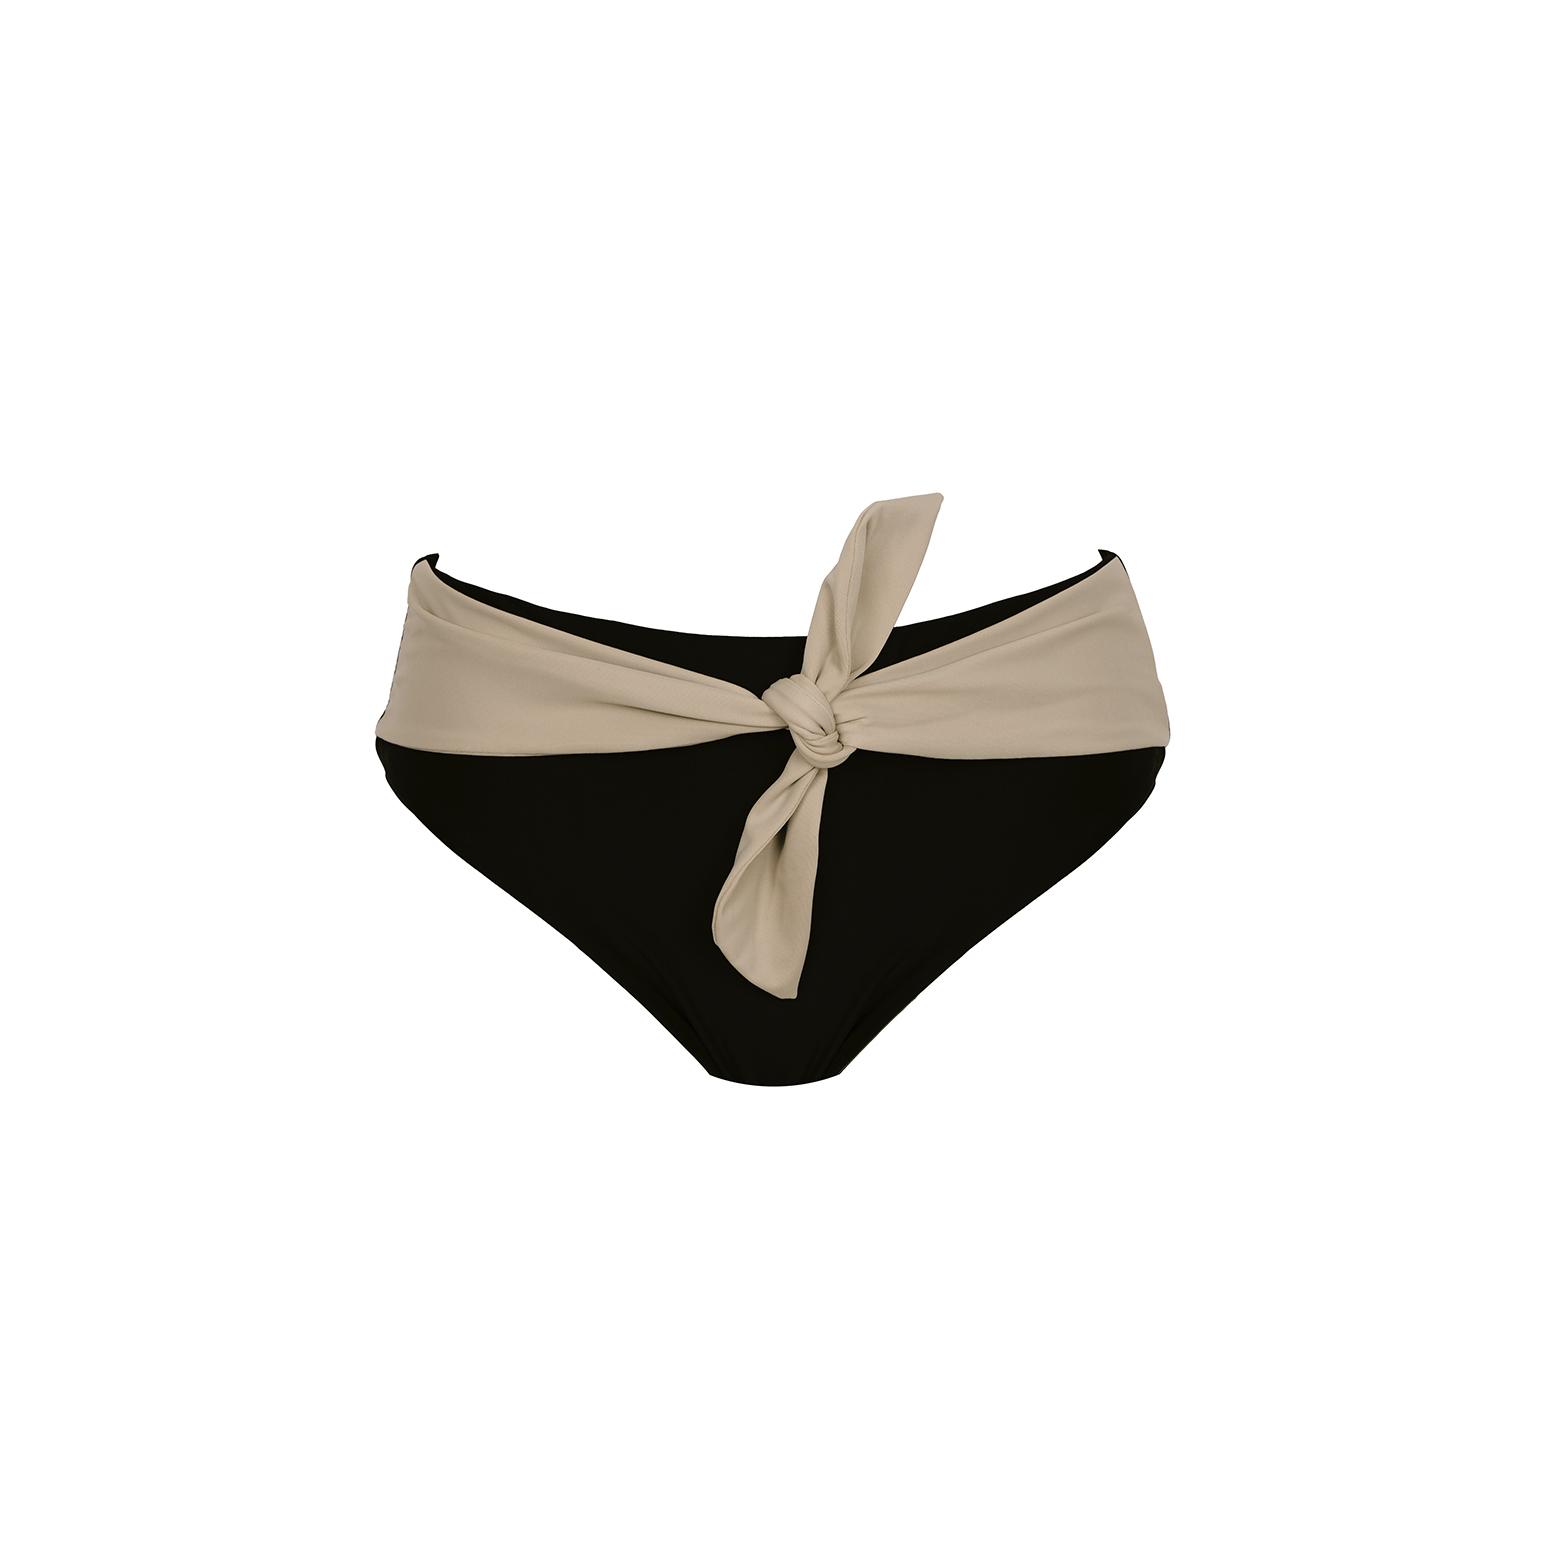 Linda Raff Collection -SLIP BELT ECO BLACK & NUDE